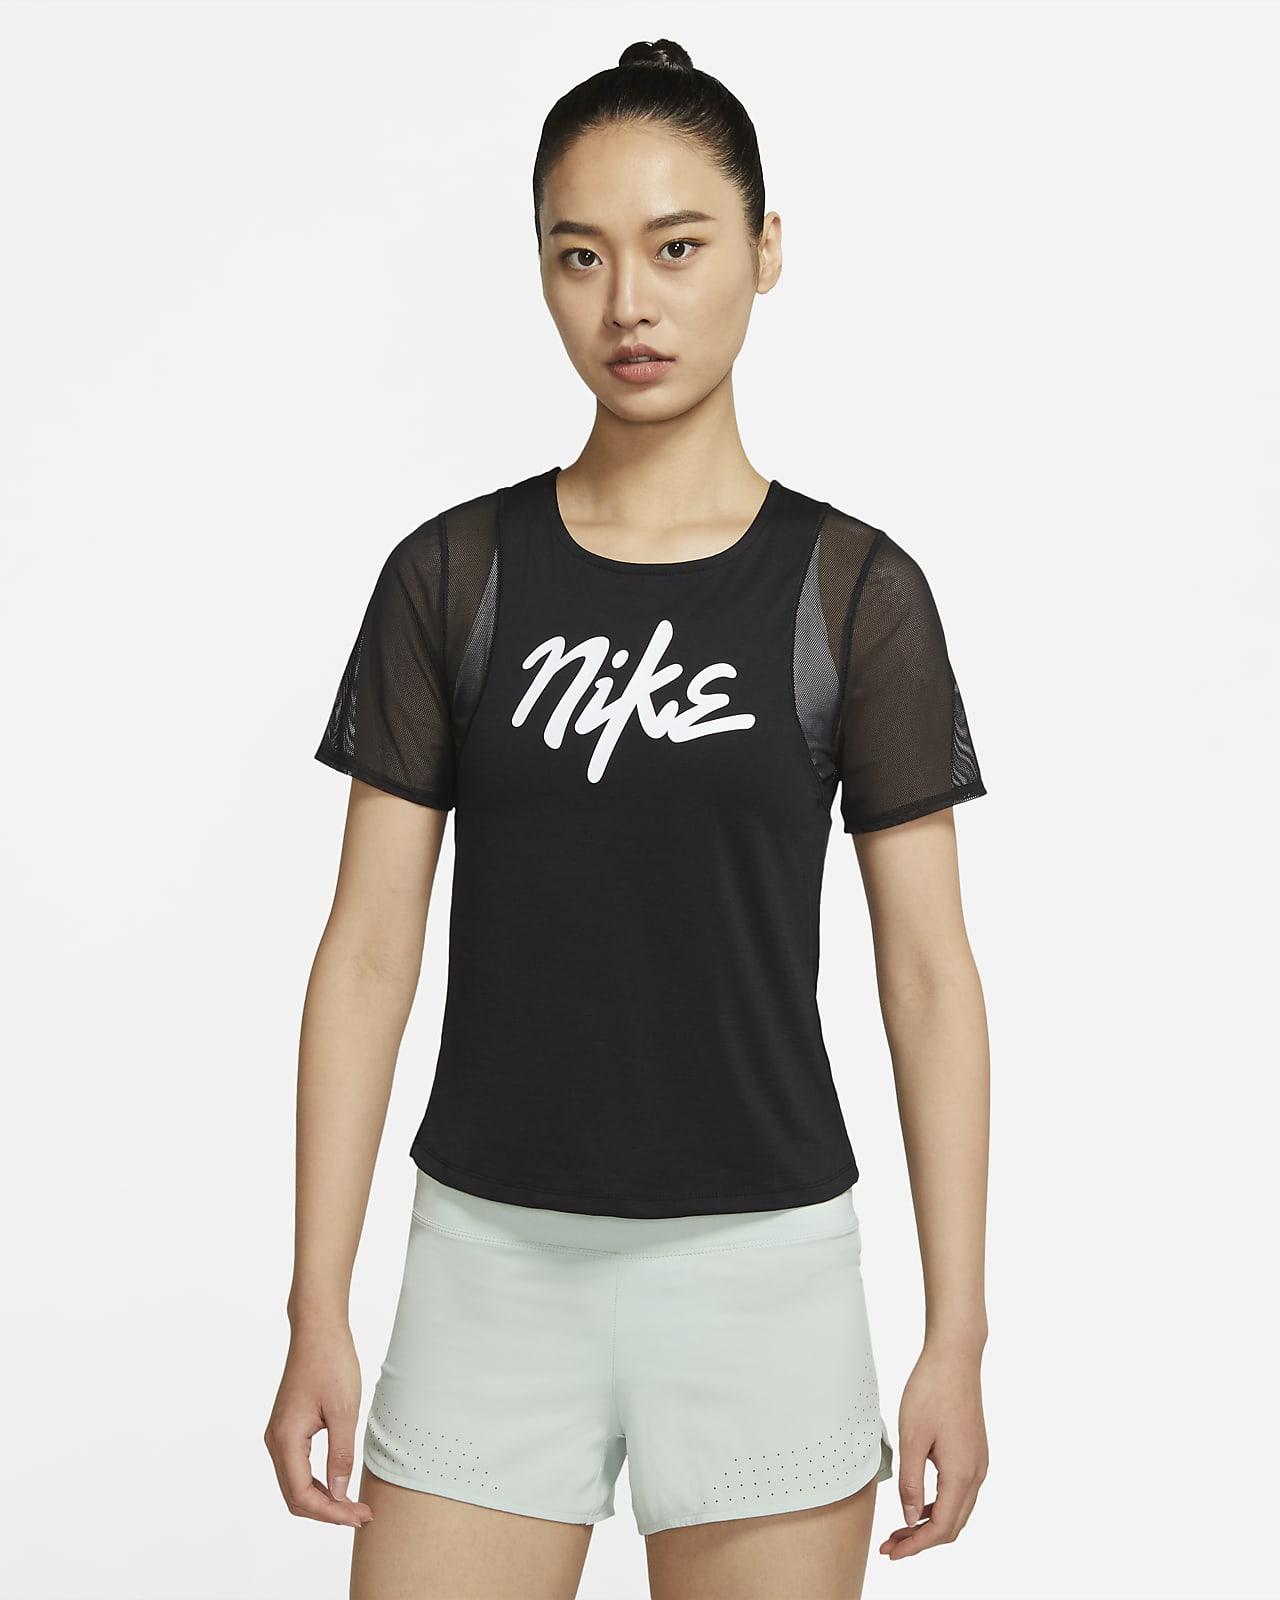 Nike Women's Running Top